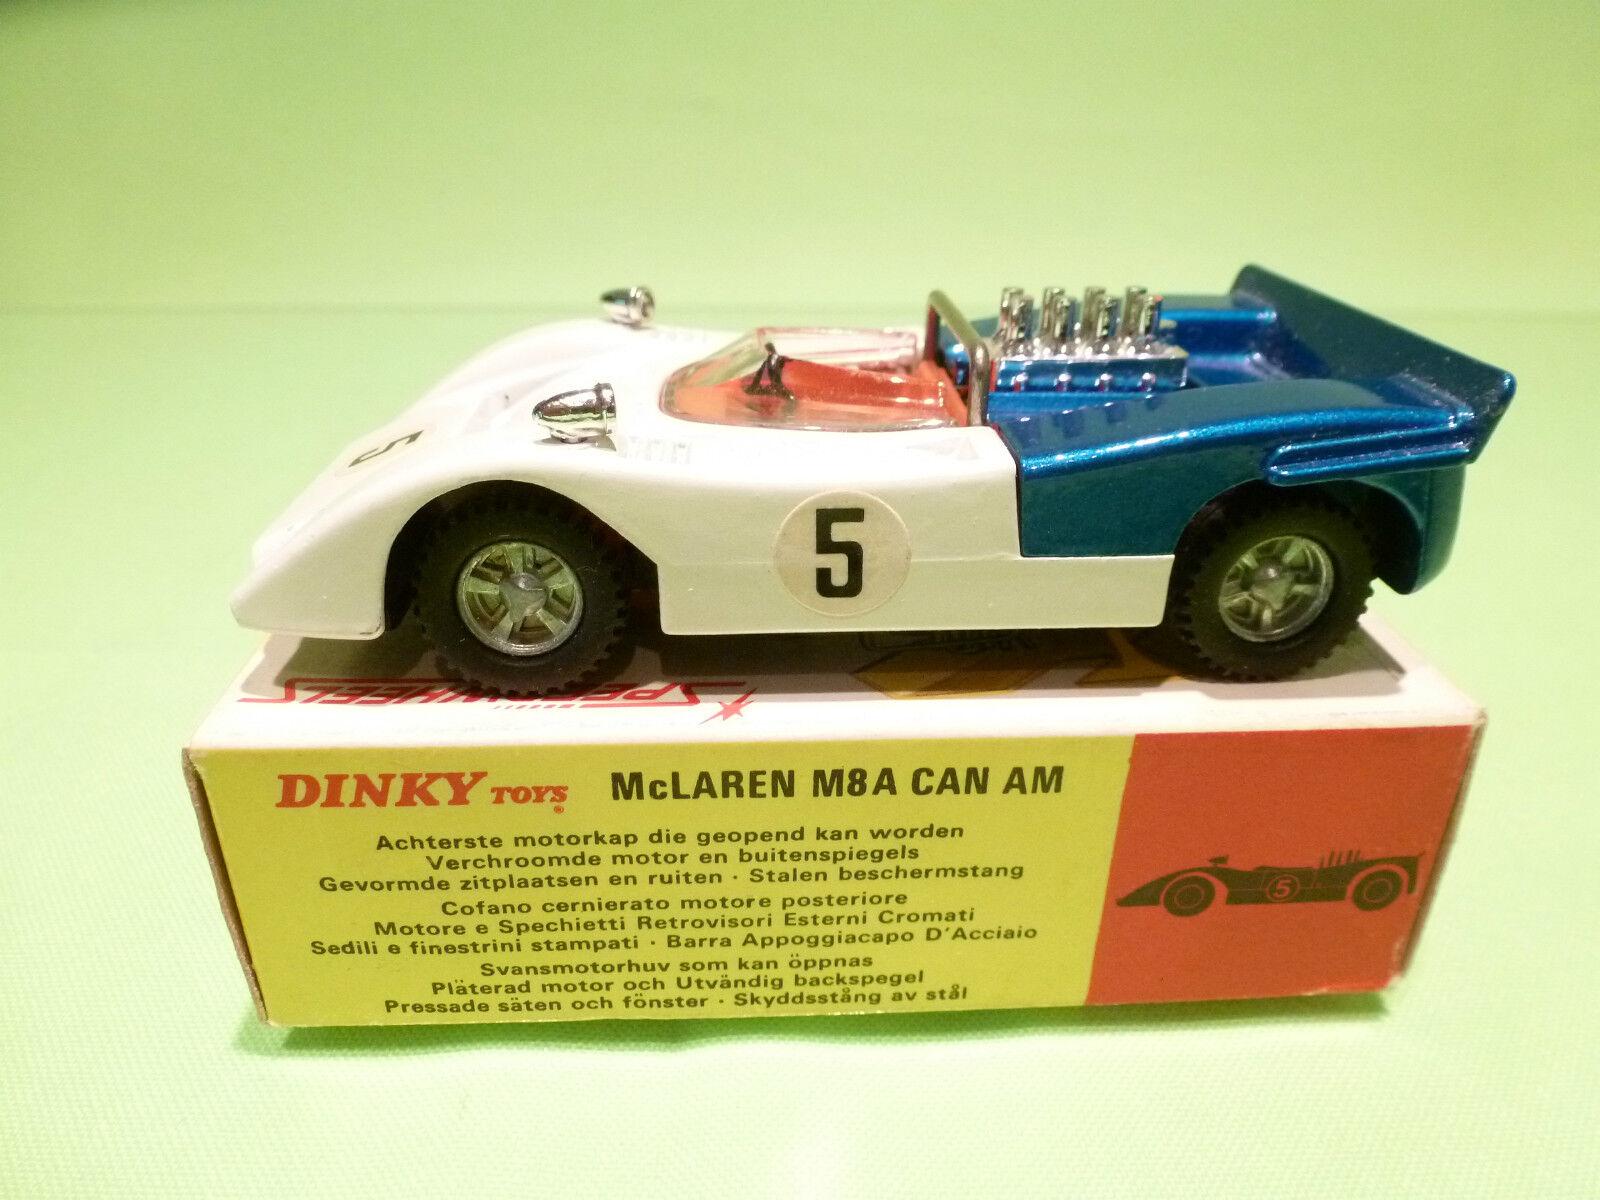 DINKY TOYS  223 MCLAREN M8A CAN AM - WHITE WHITE WHITE 1 43 - RARE SELTEN - NEAR MINT IN BOX 9692eb